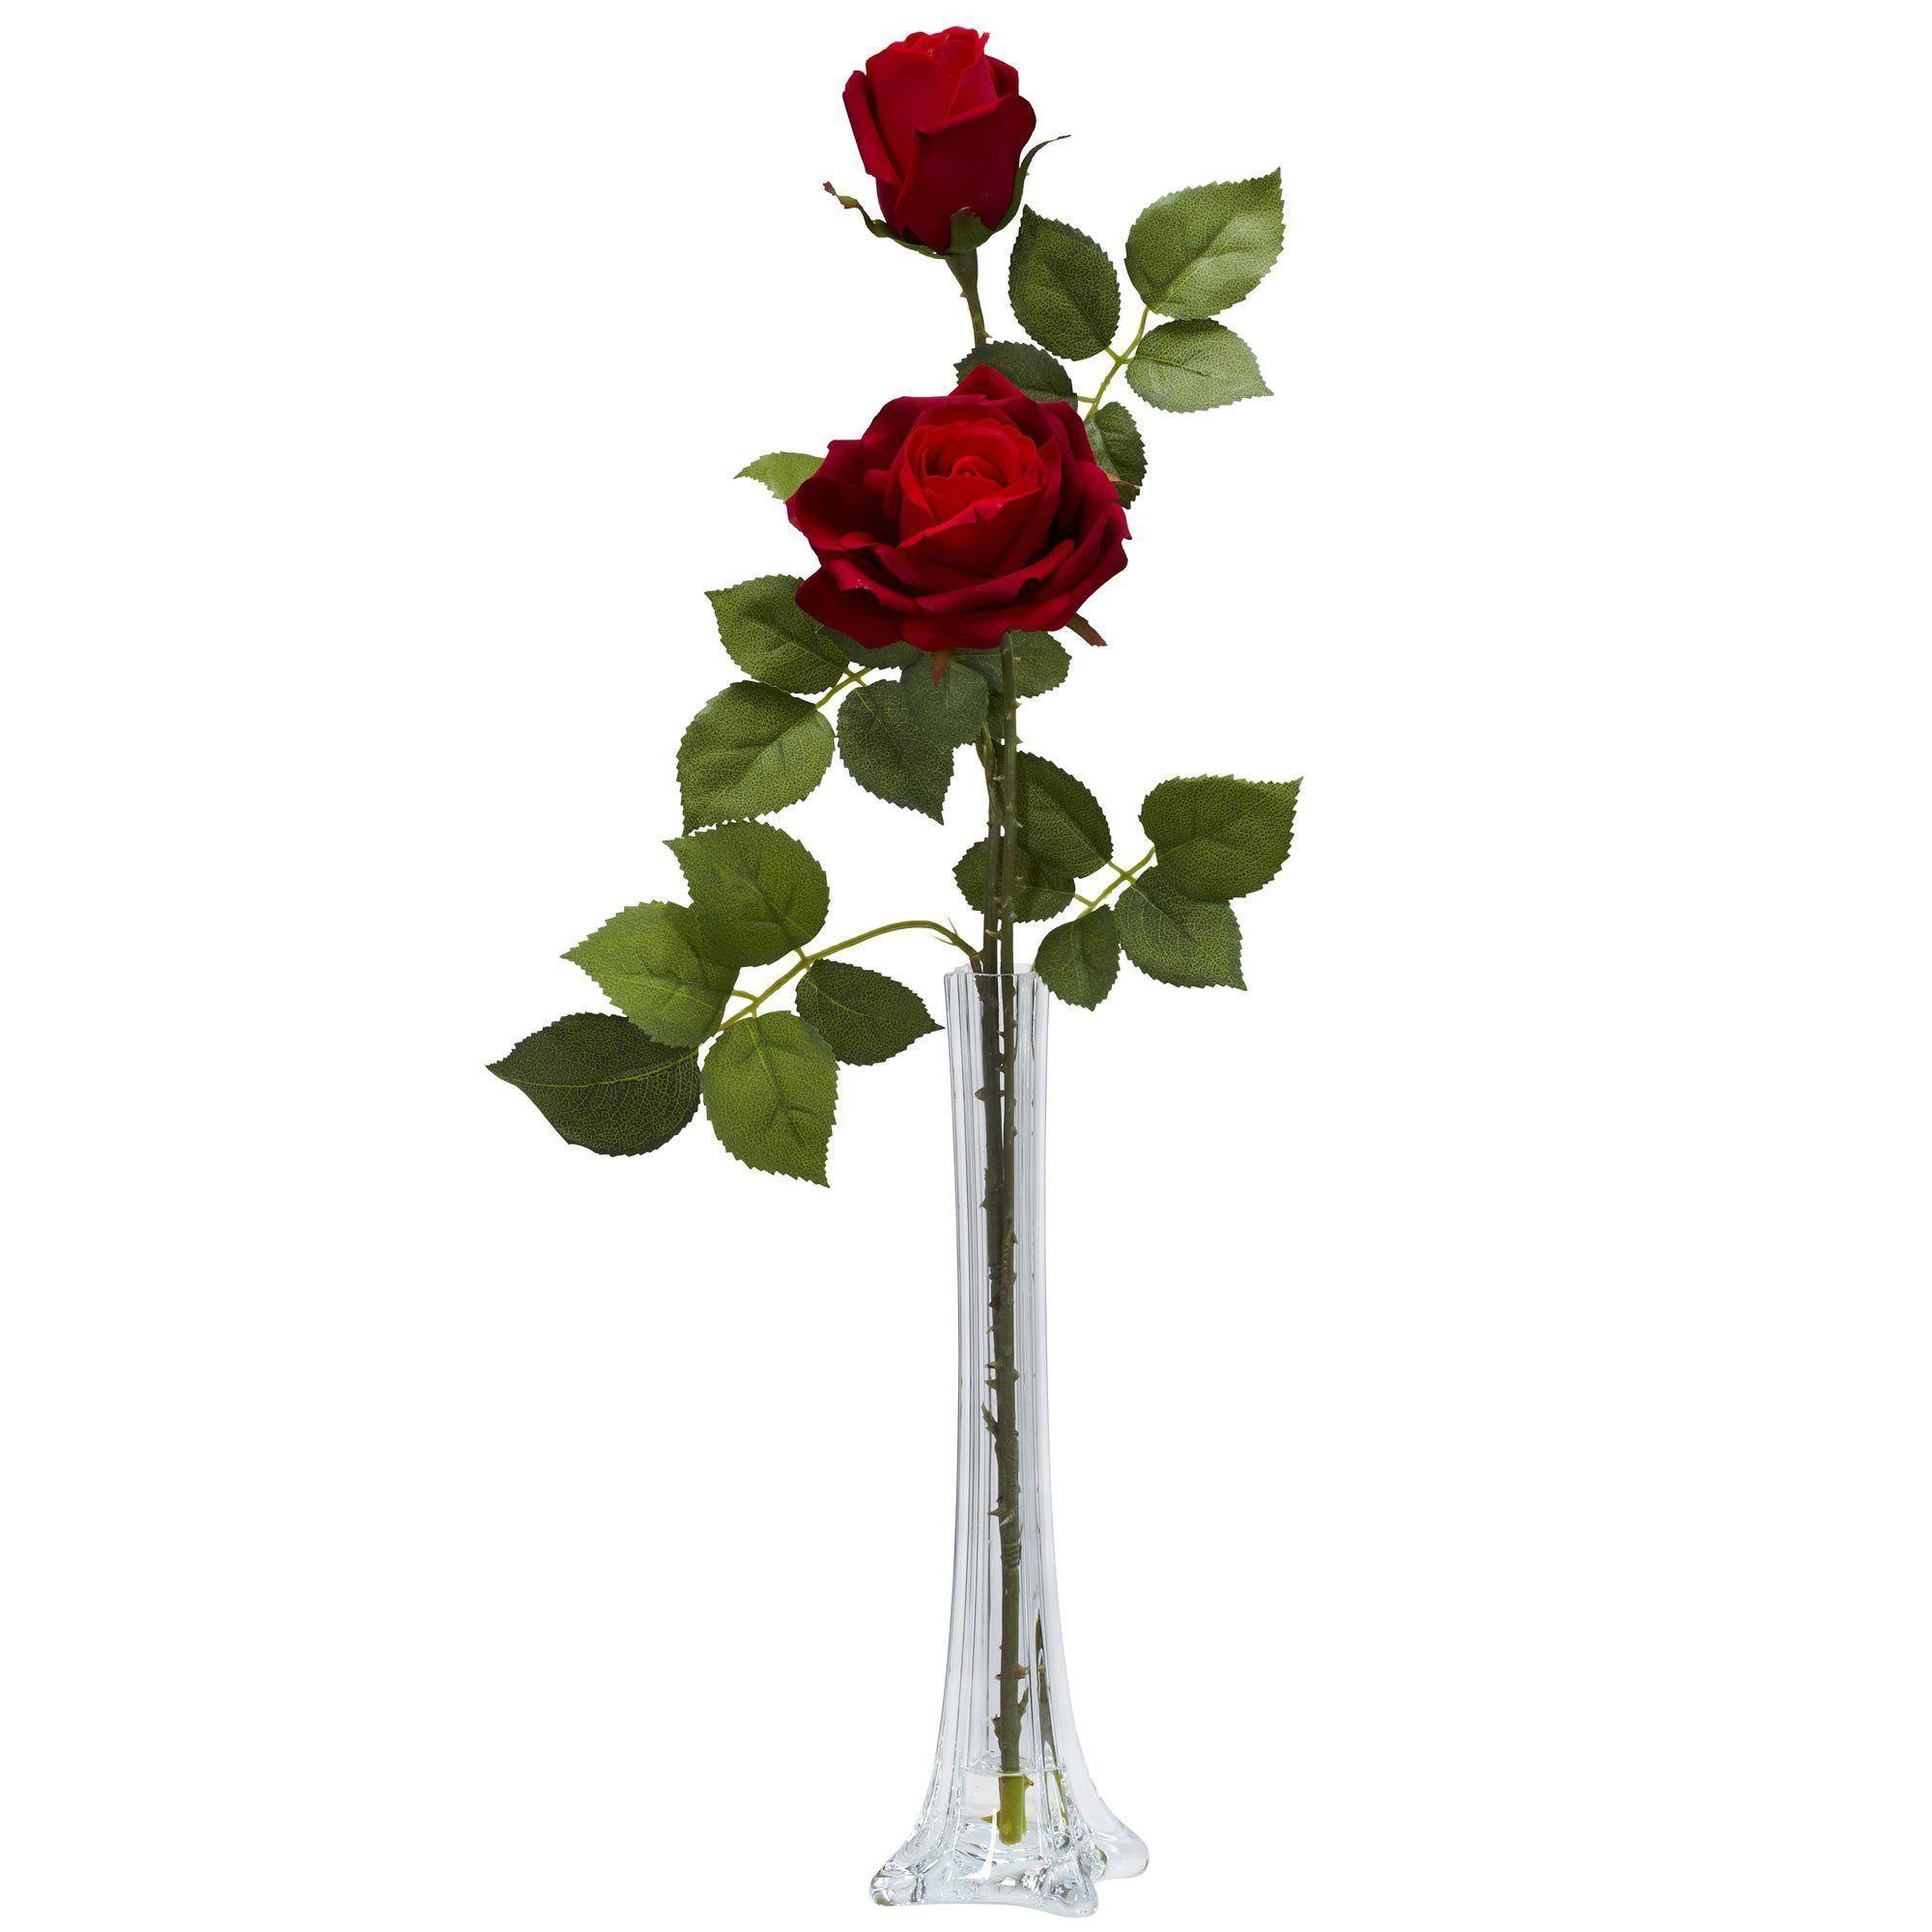 Roses W Tall Bud Vase Silk Flower Arrangement In 2020 Artificial